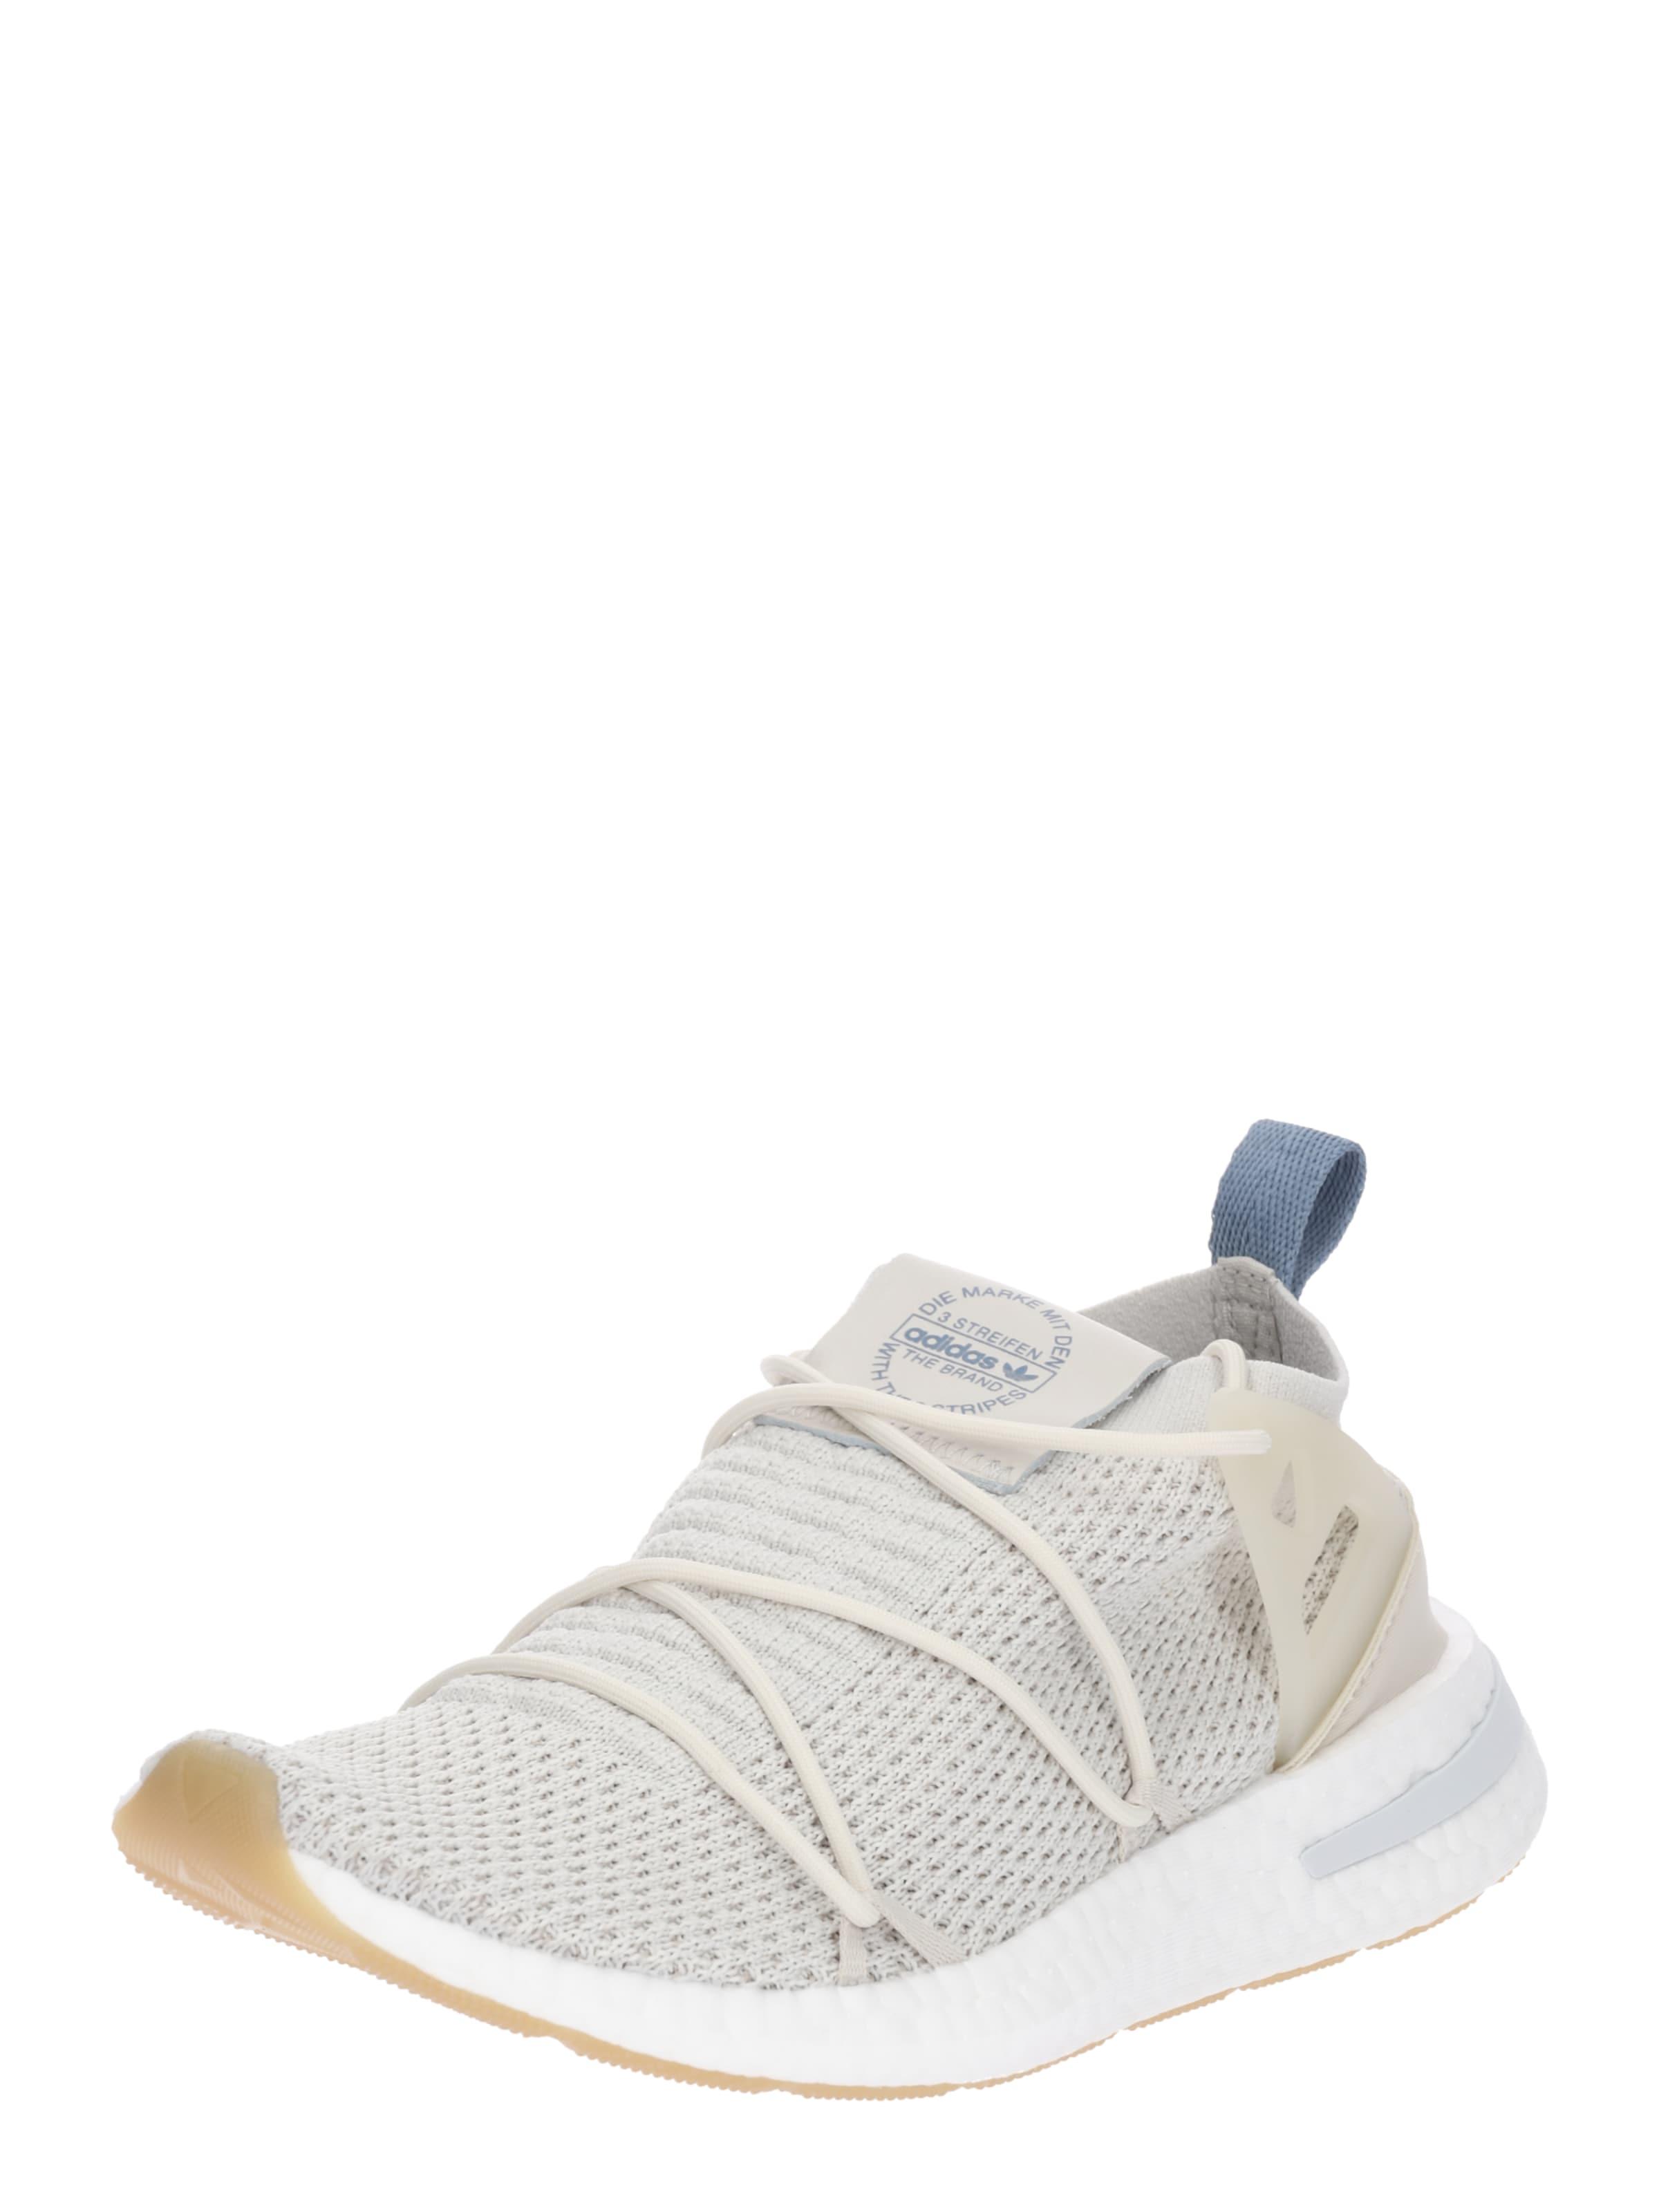 ADIDAS ORIGINALS Sneaker  ARKYN